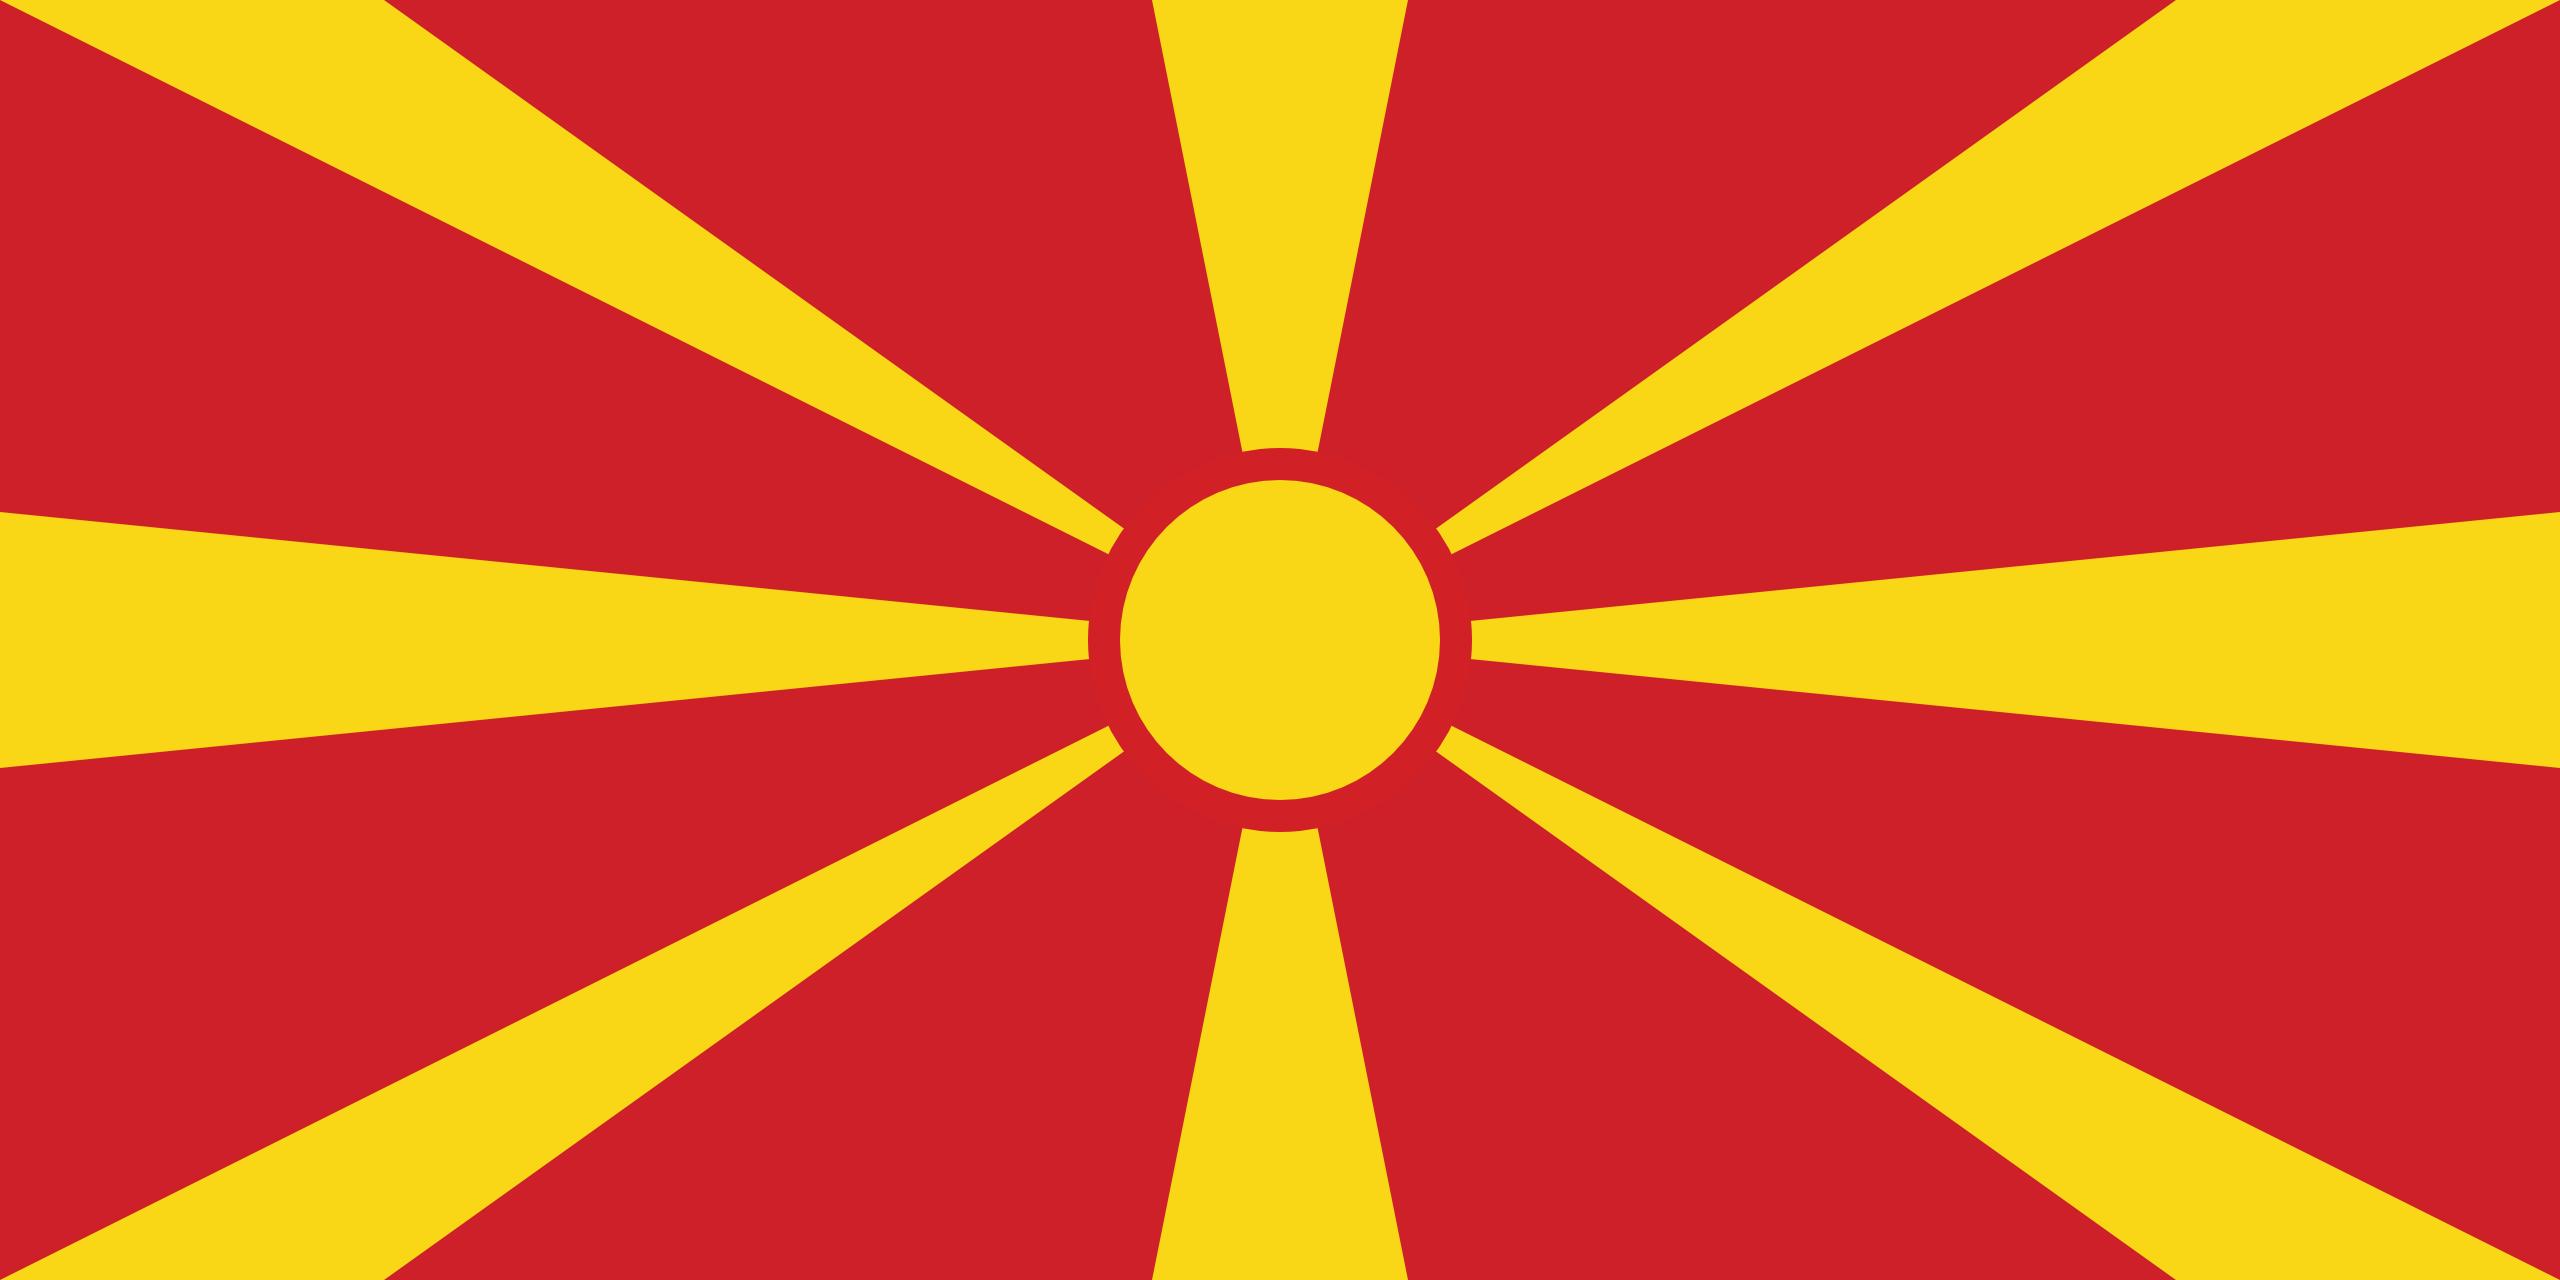 macedonia, देश, emblema, लोग�प्रतीकbolo - HD वॉलपेपर - प्रोफेसर-falken.com